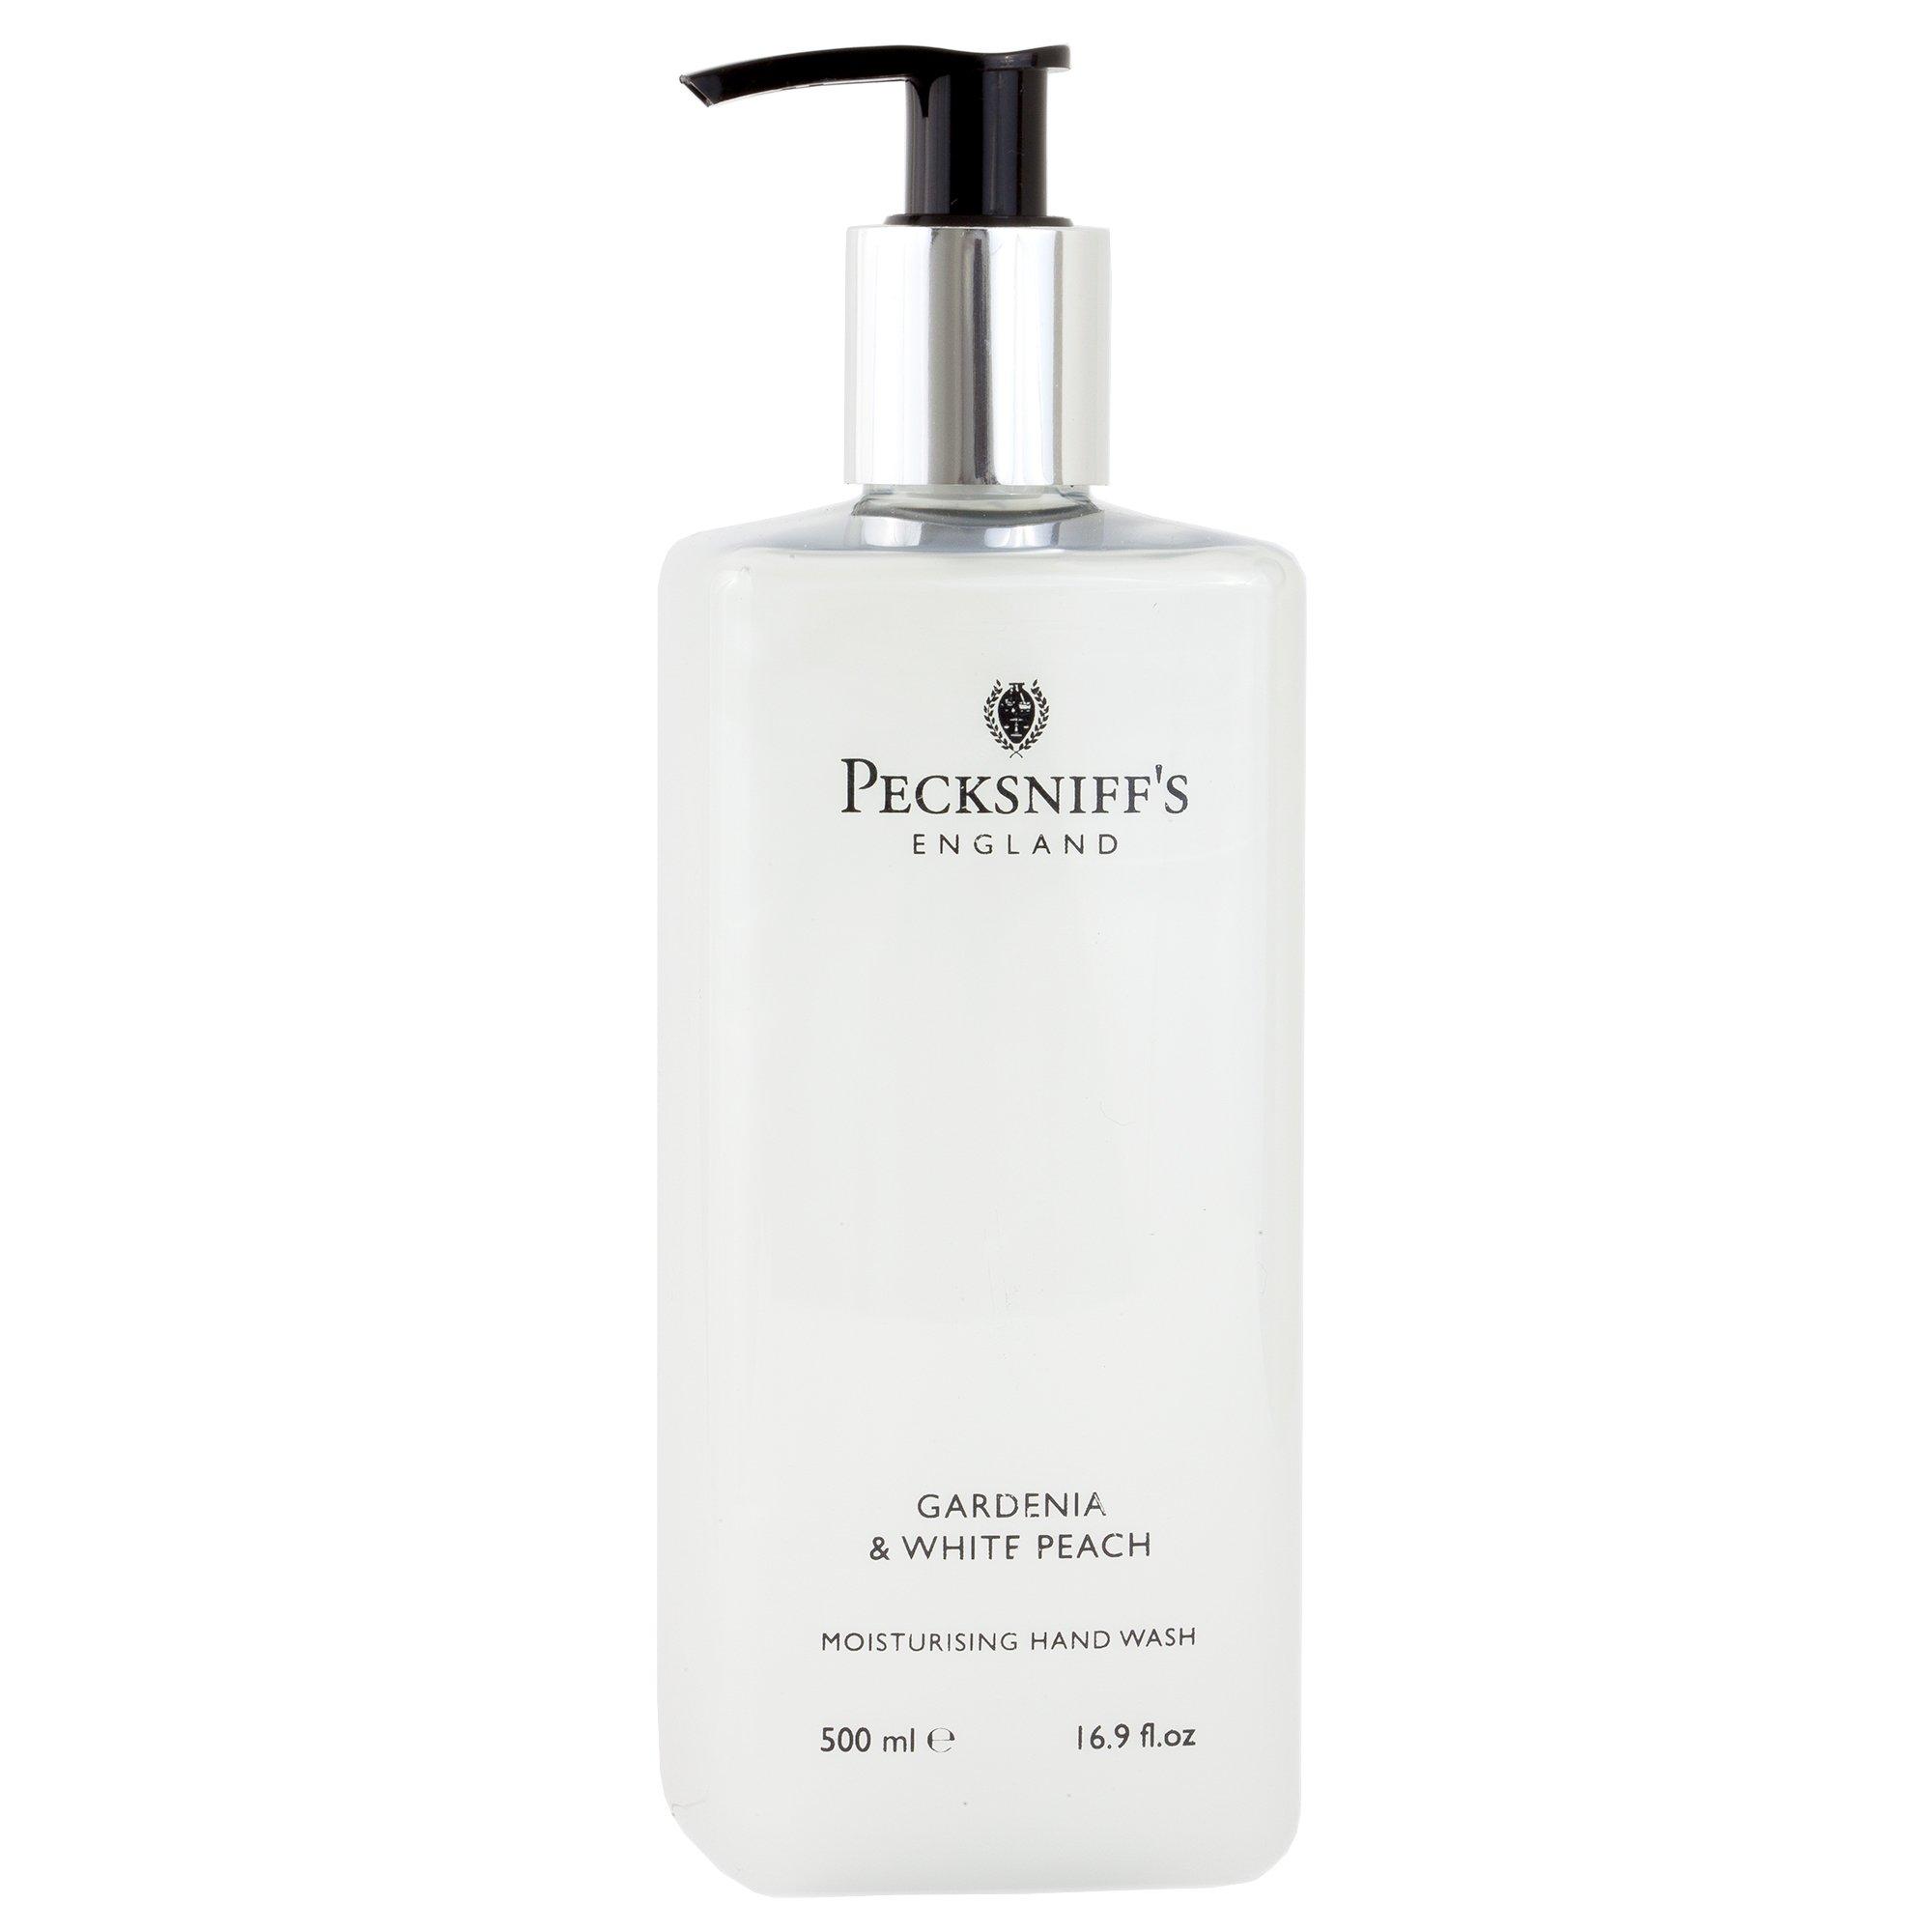 Pecksniff's Gardenia and White Peach Hand Wash 16.9 oz